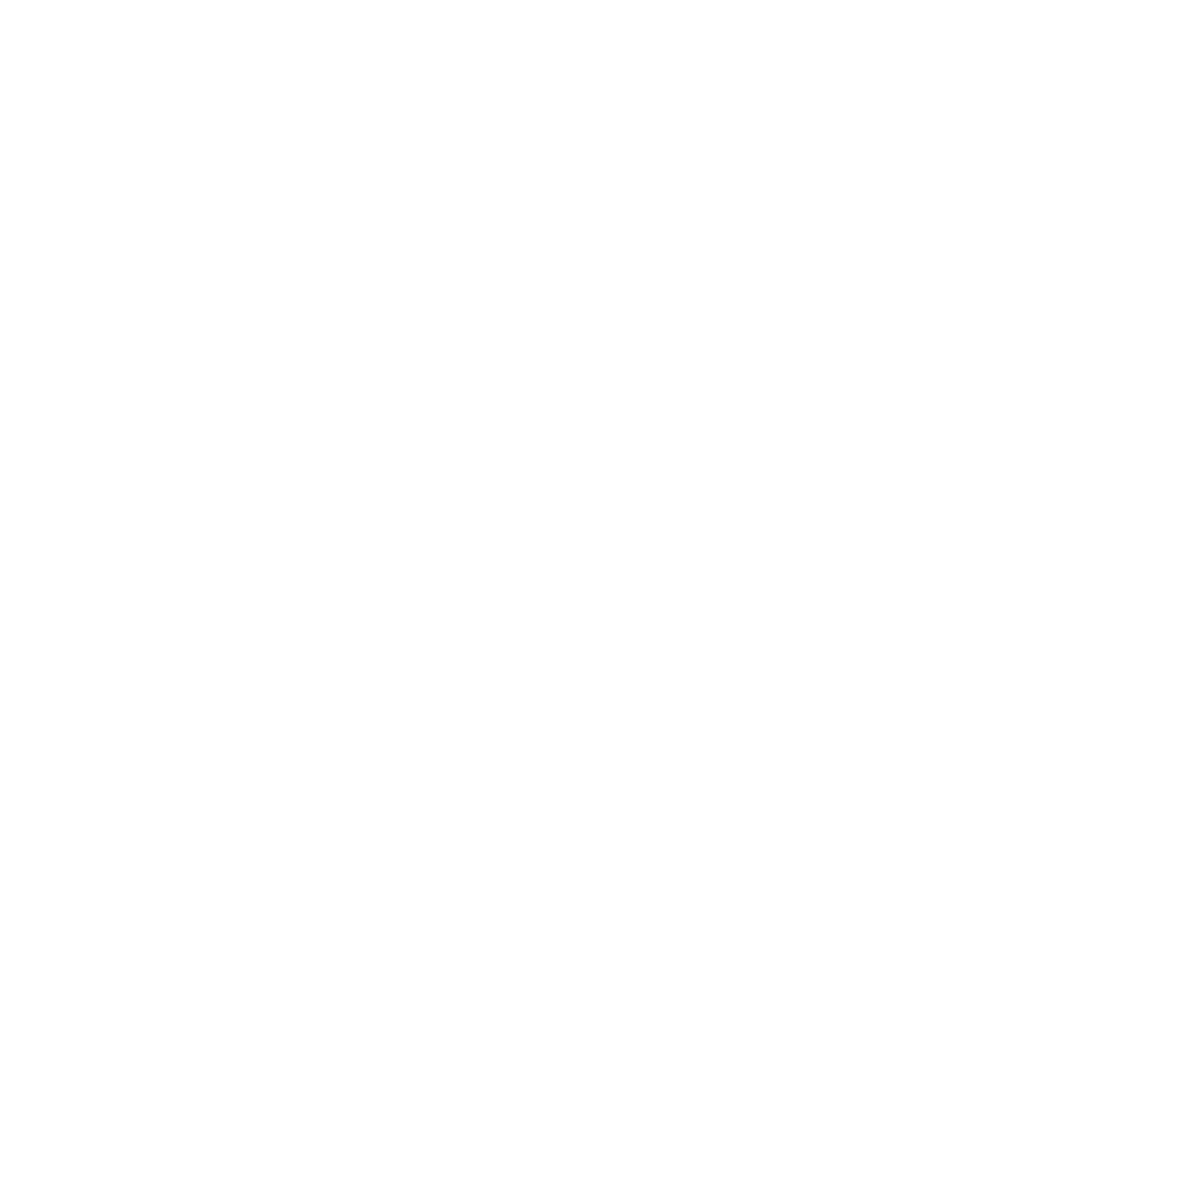 Icon FEESTJE